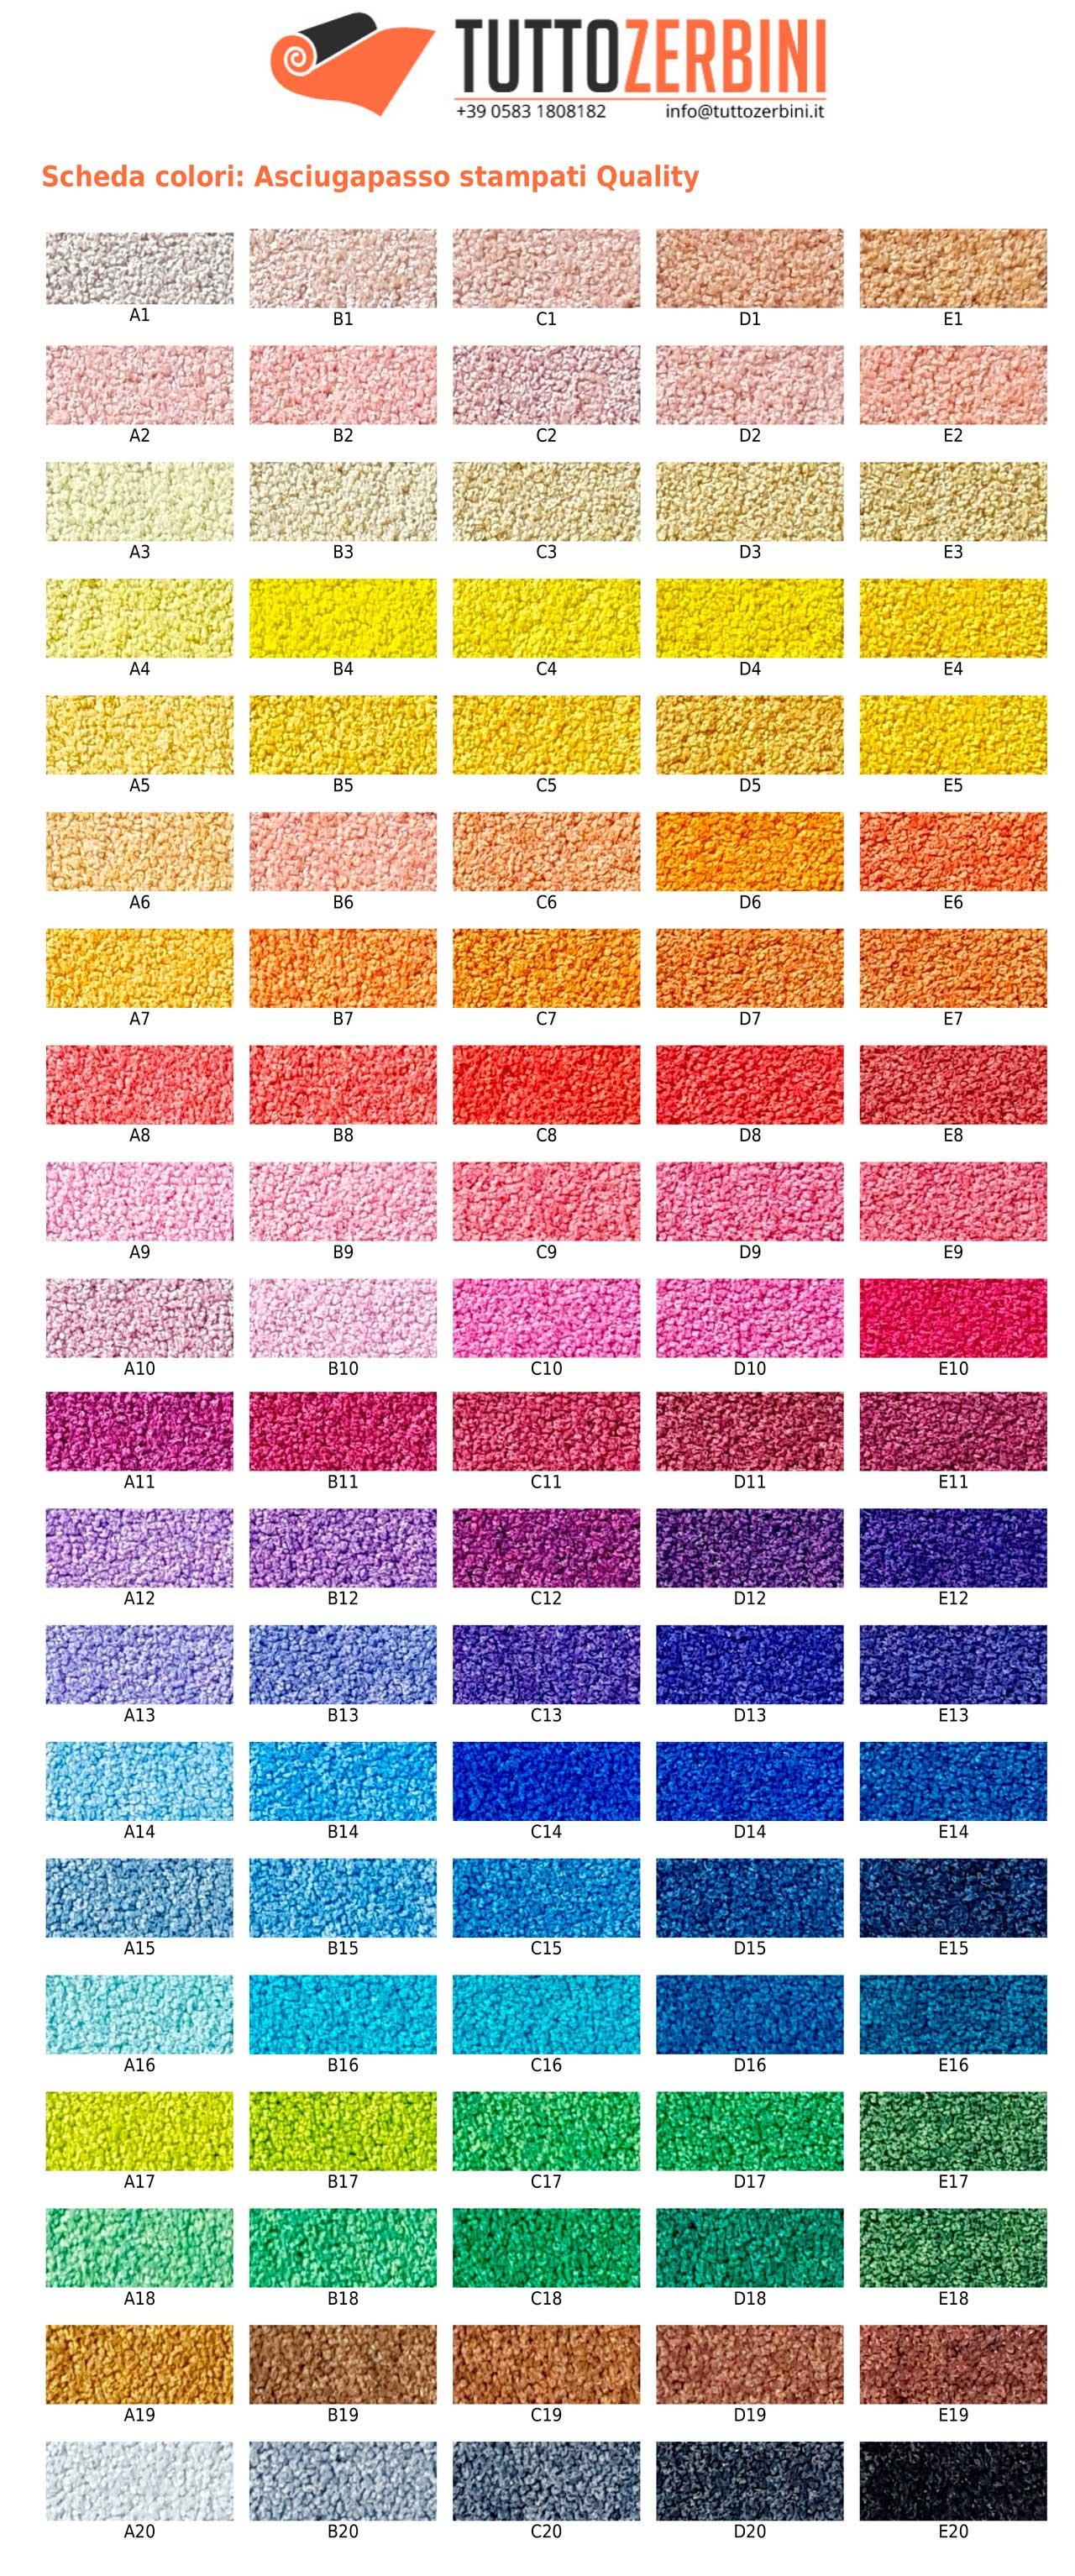 Scheda colori asciugapasso Quality